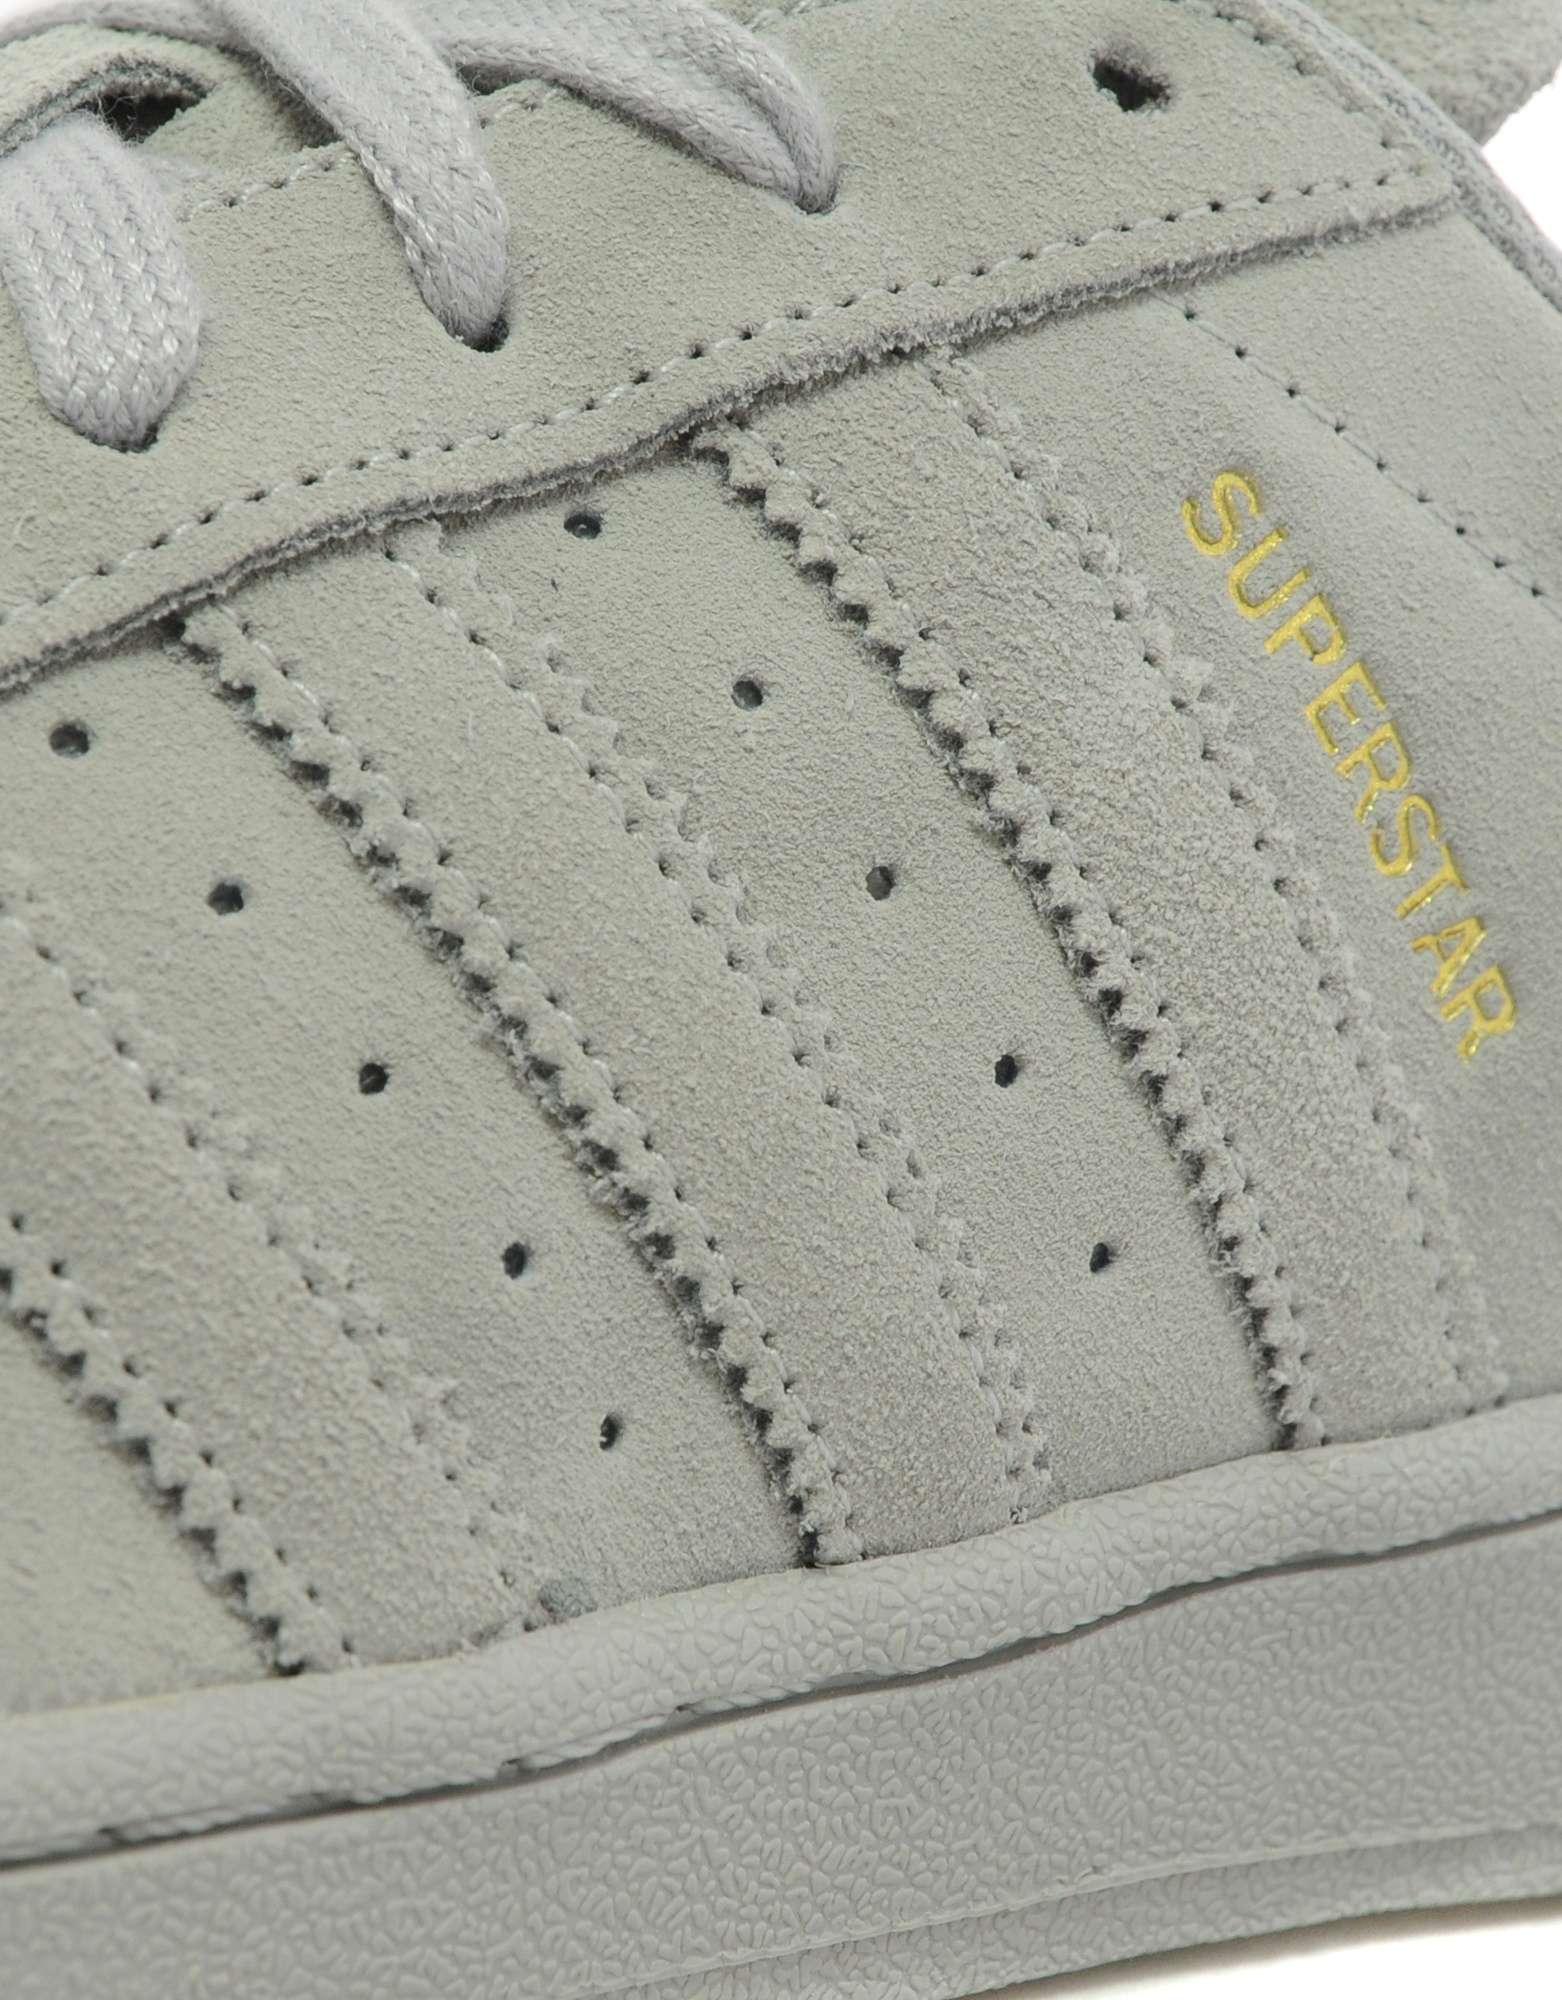 adidas Originals Superstar Suede